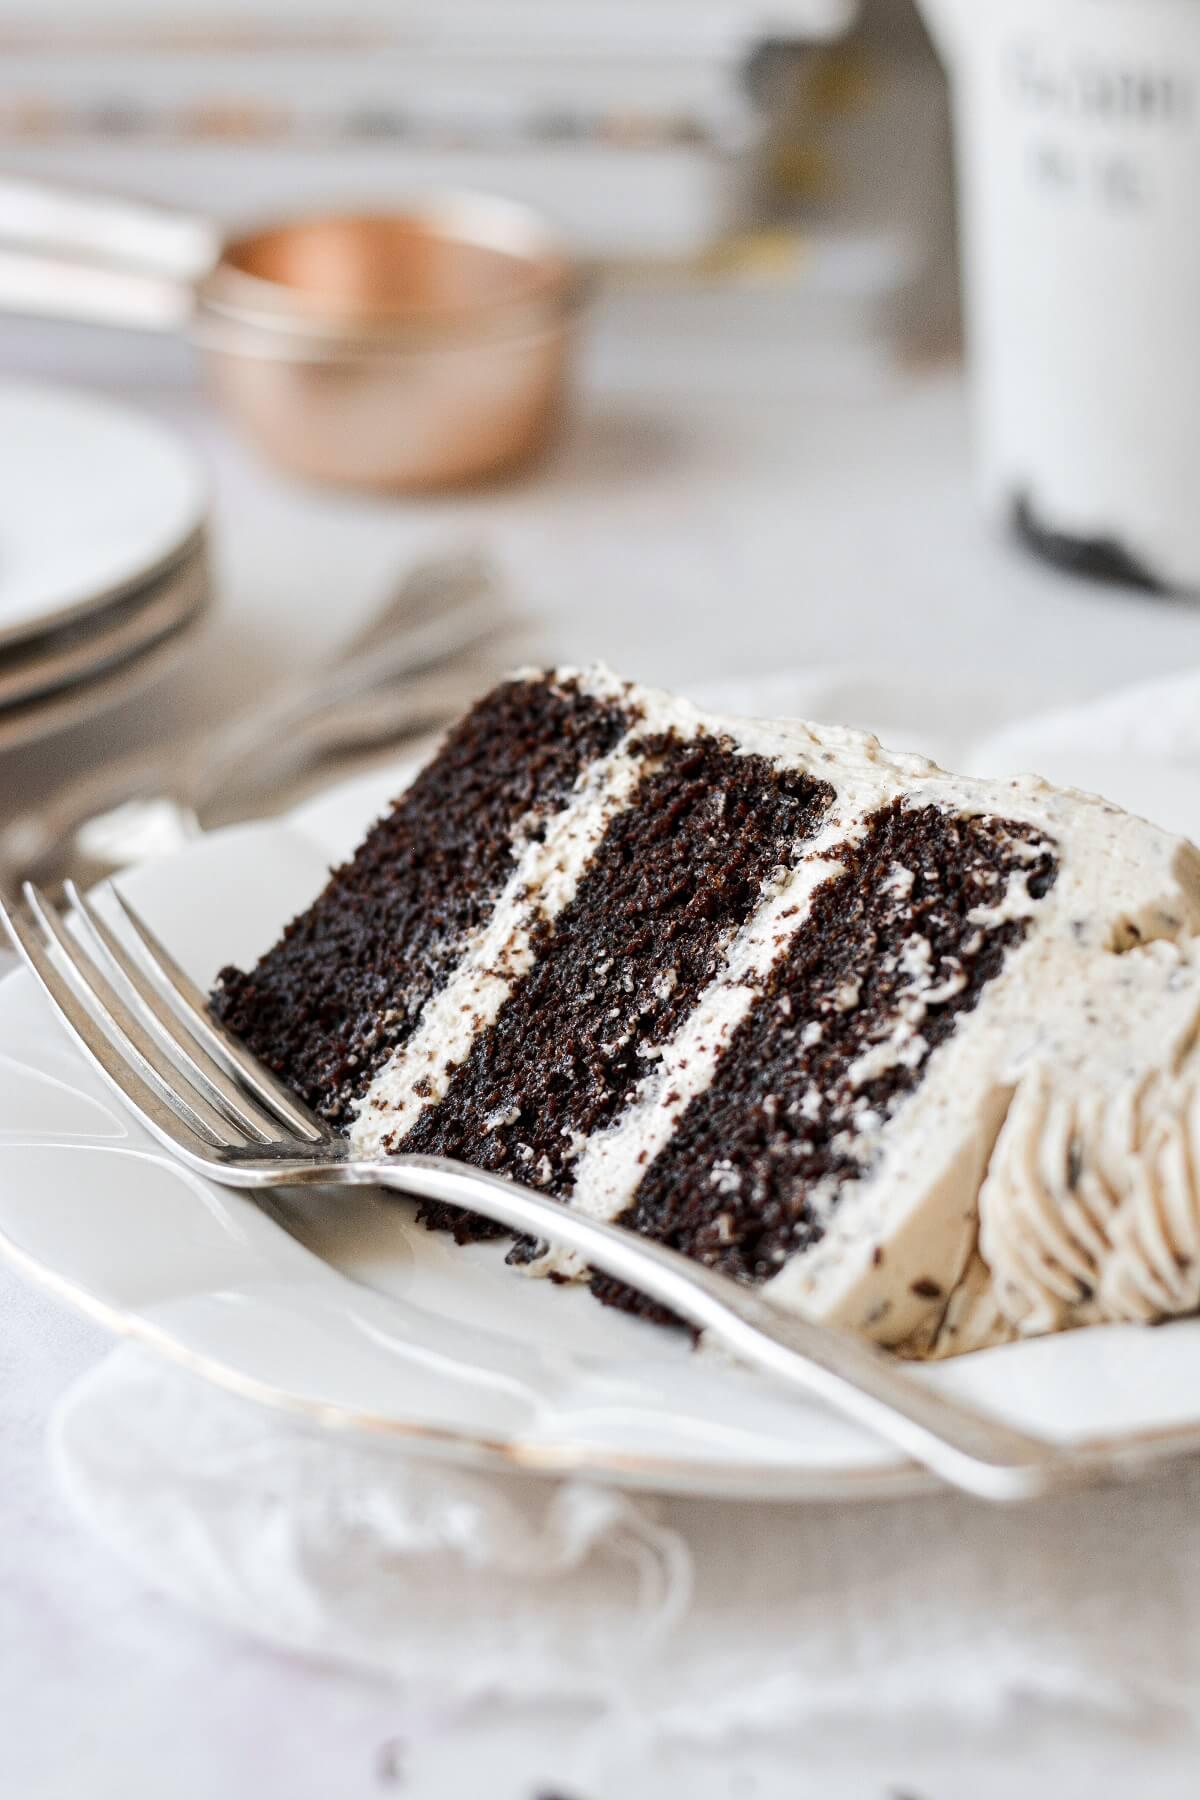 A slice of chocolate peanut butter cake.